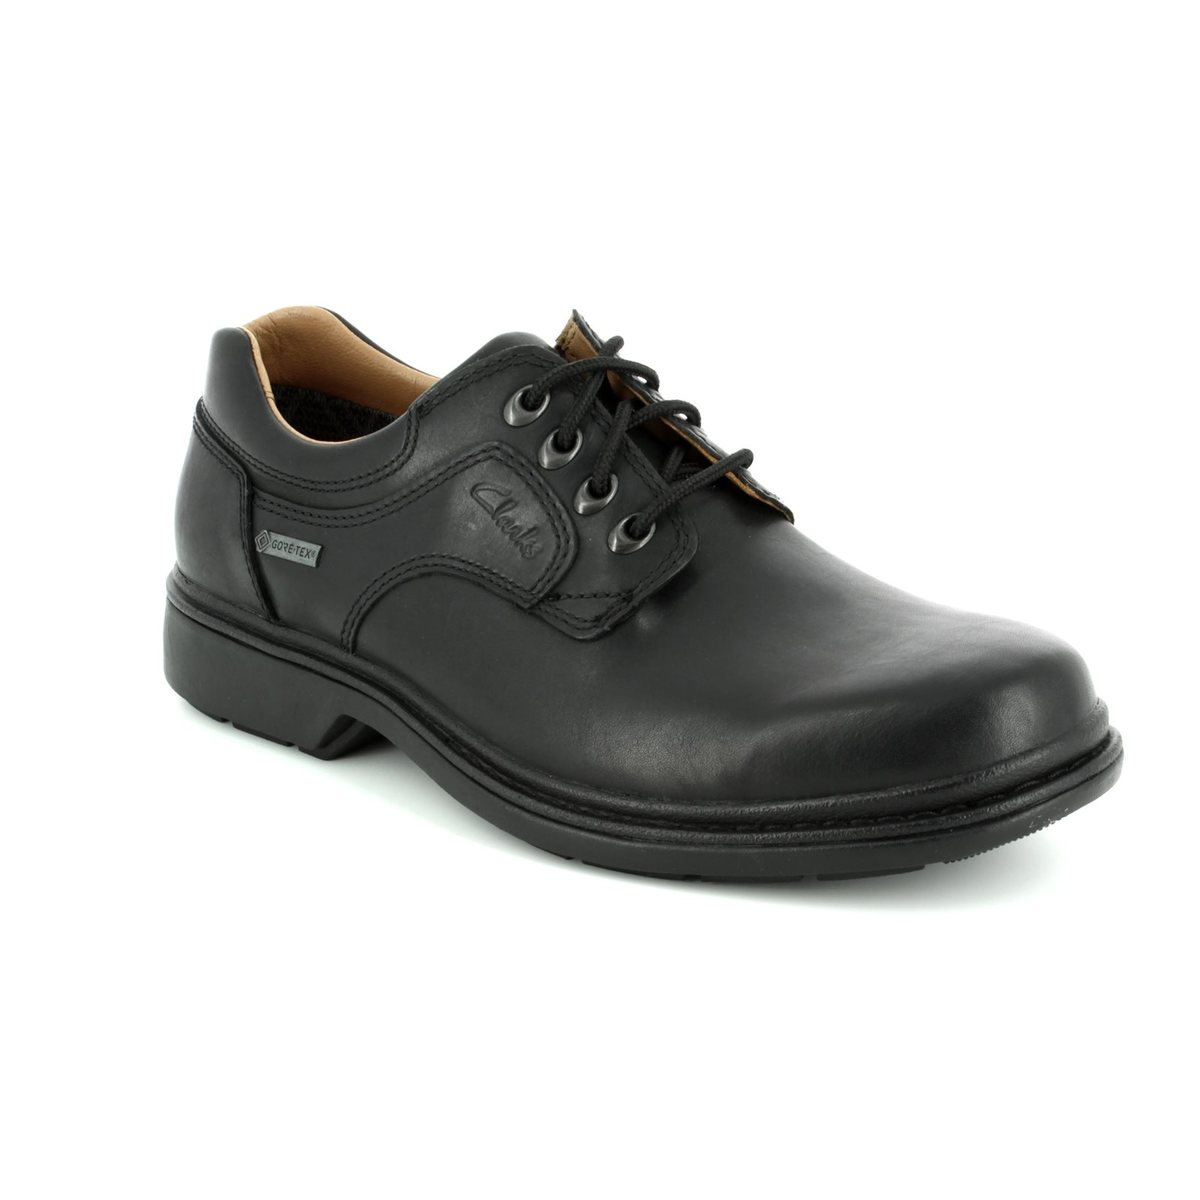 2d508e27f39b Clarks Casual Shoes - Black - 1860 77G ROCKIE LO GORE-TEX